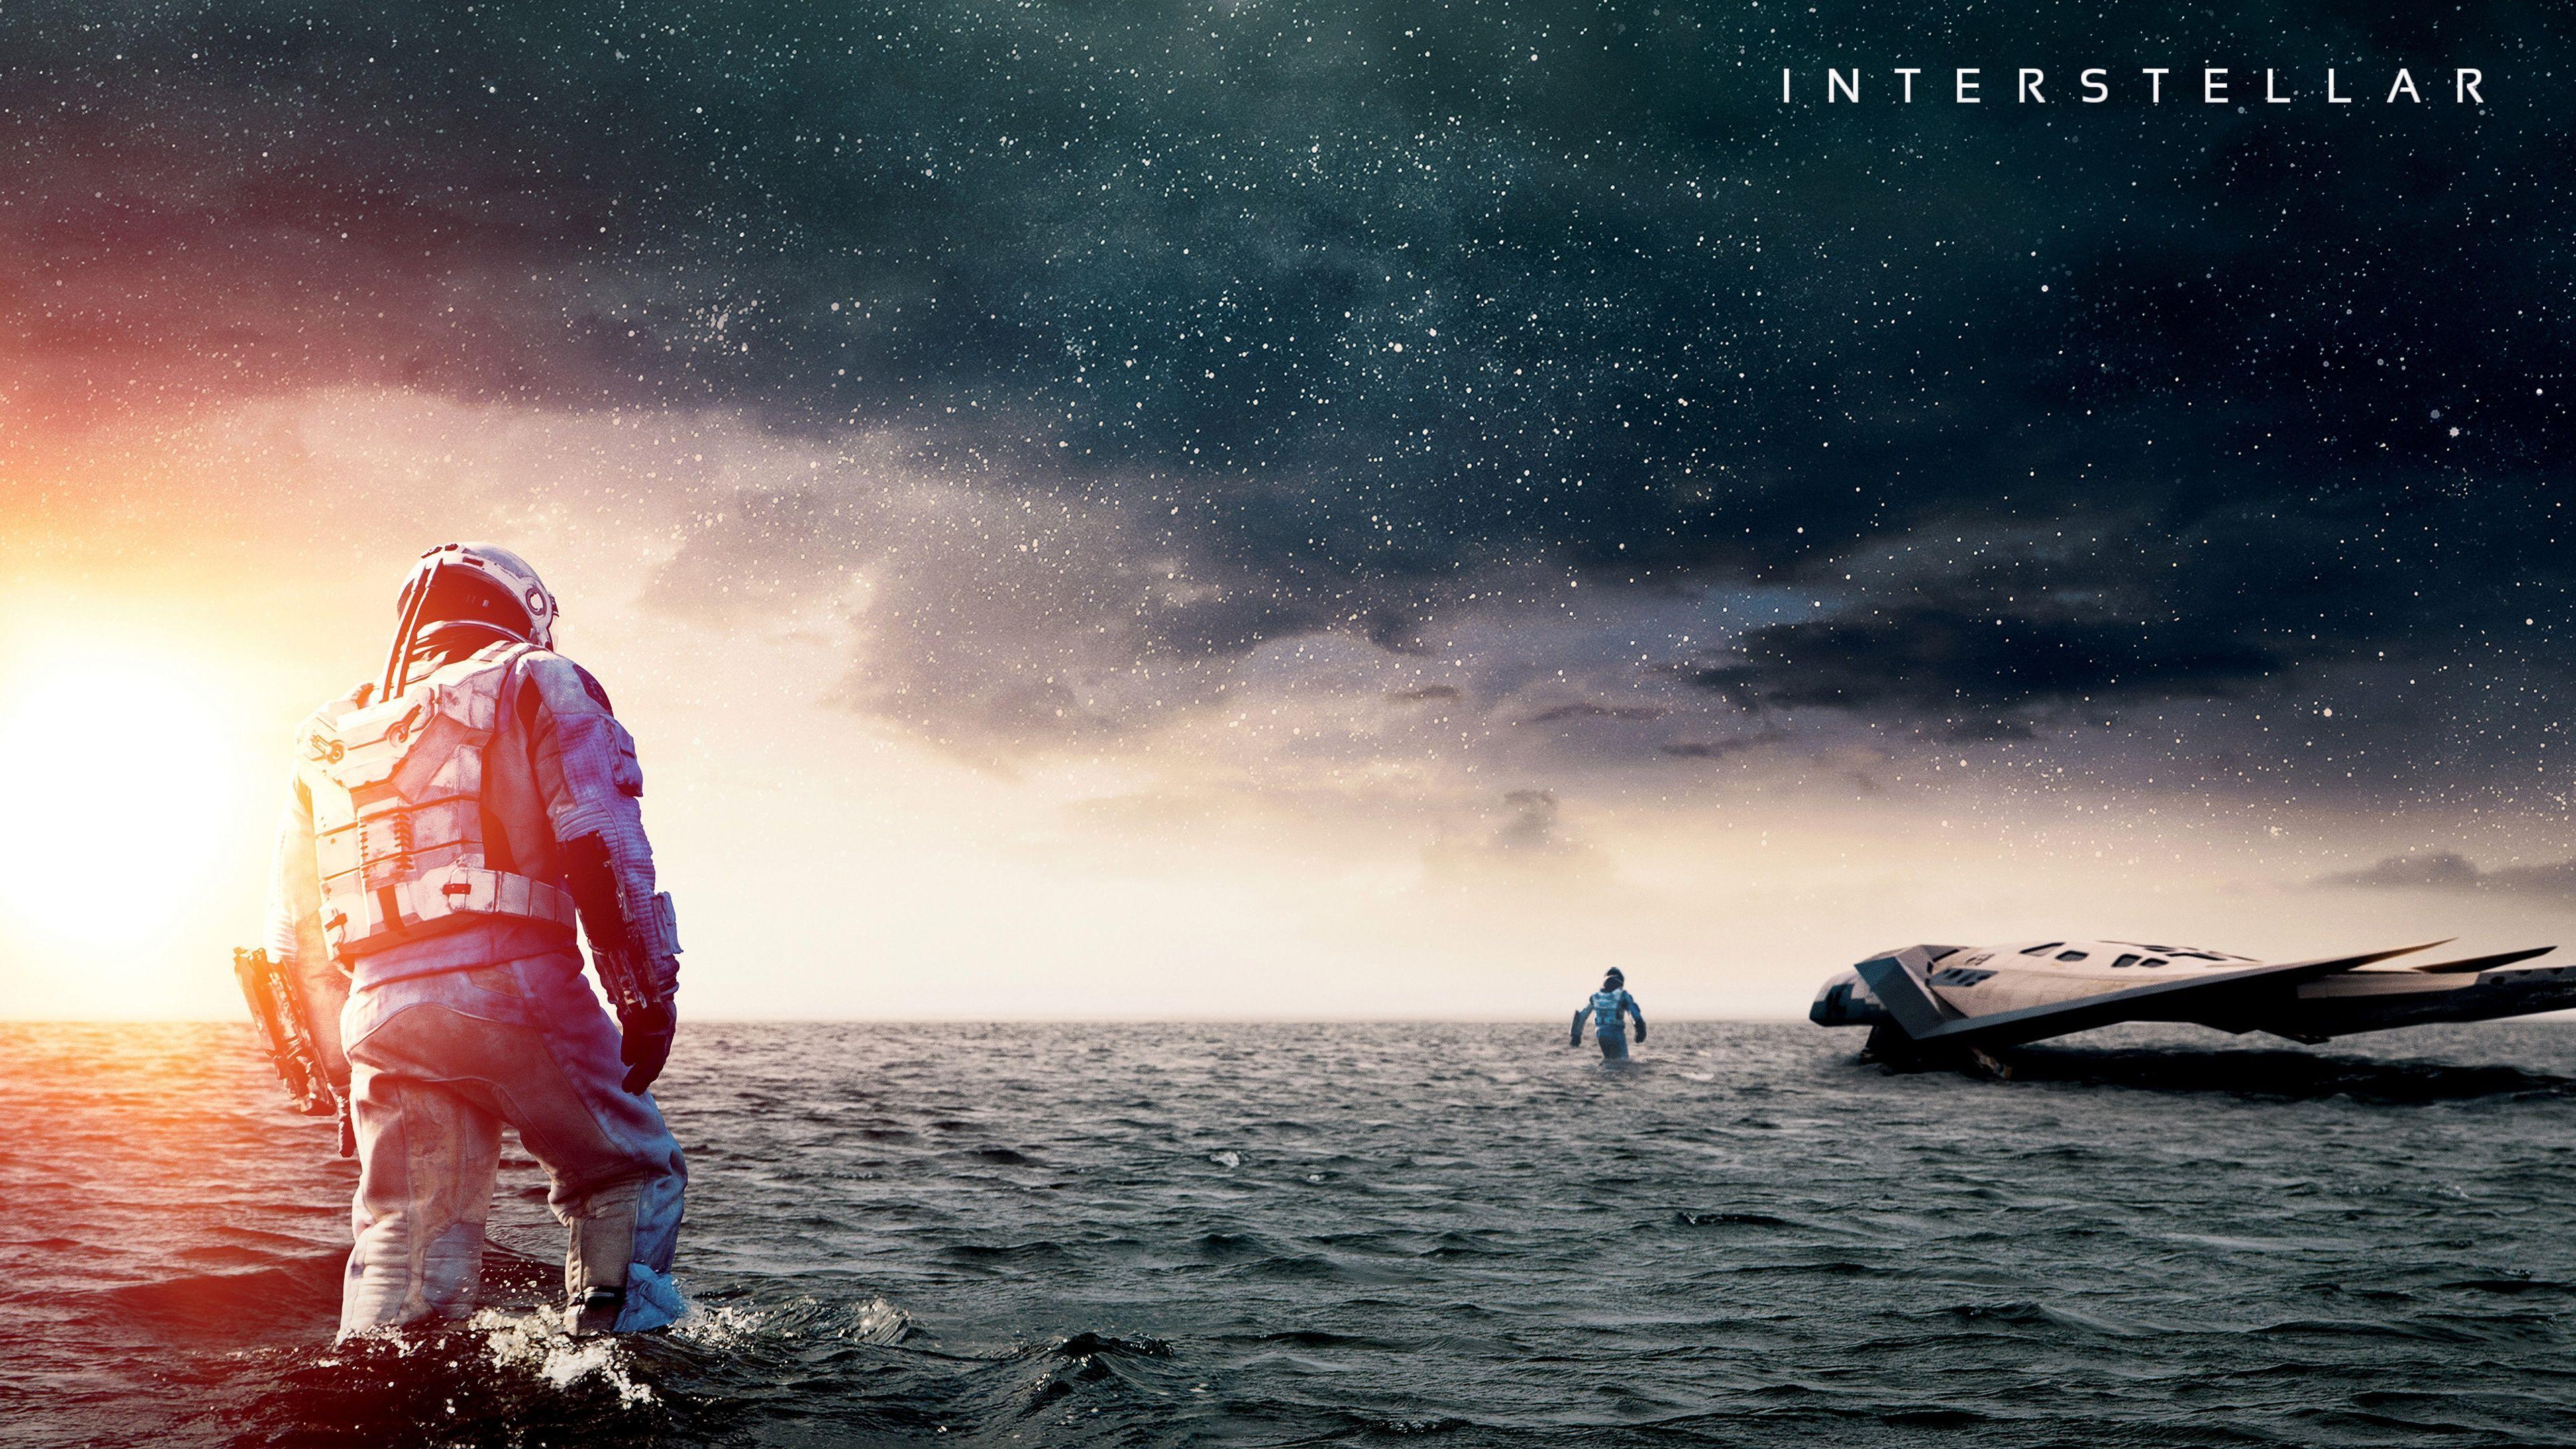 Image result for Interstellar movie hd pics